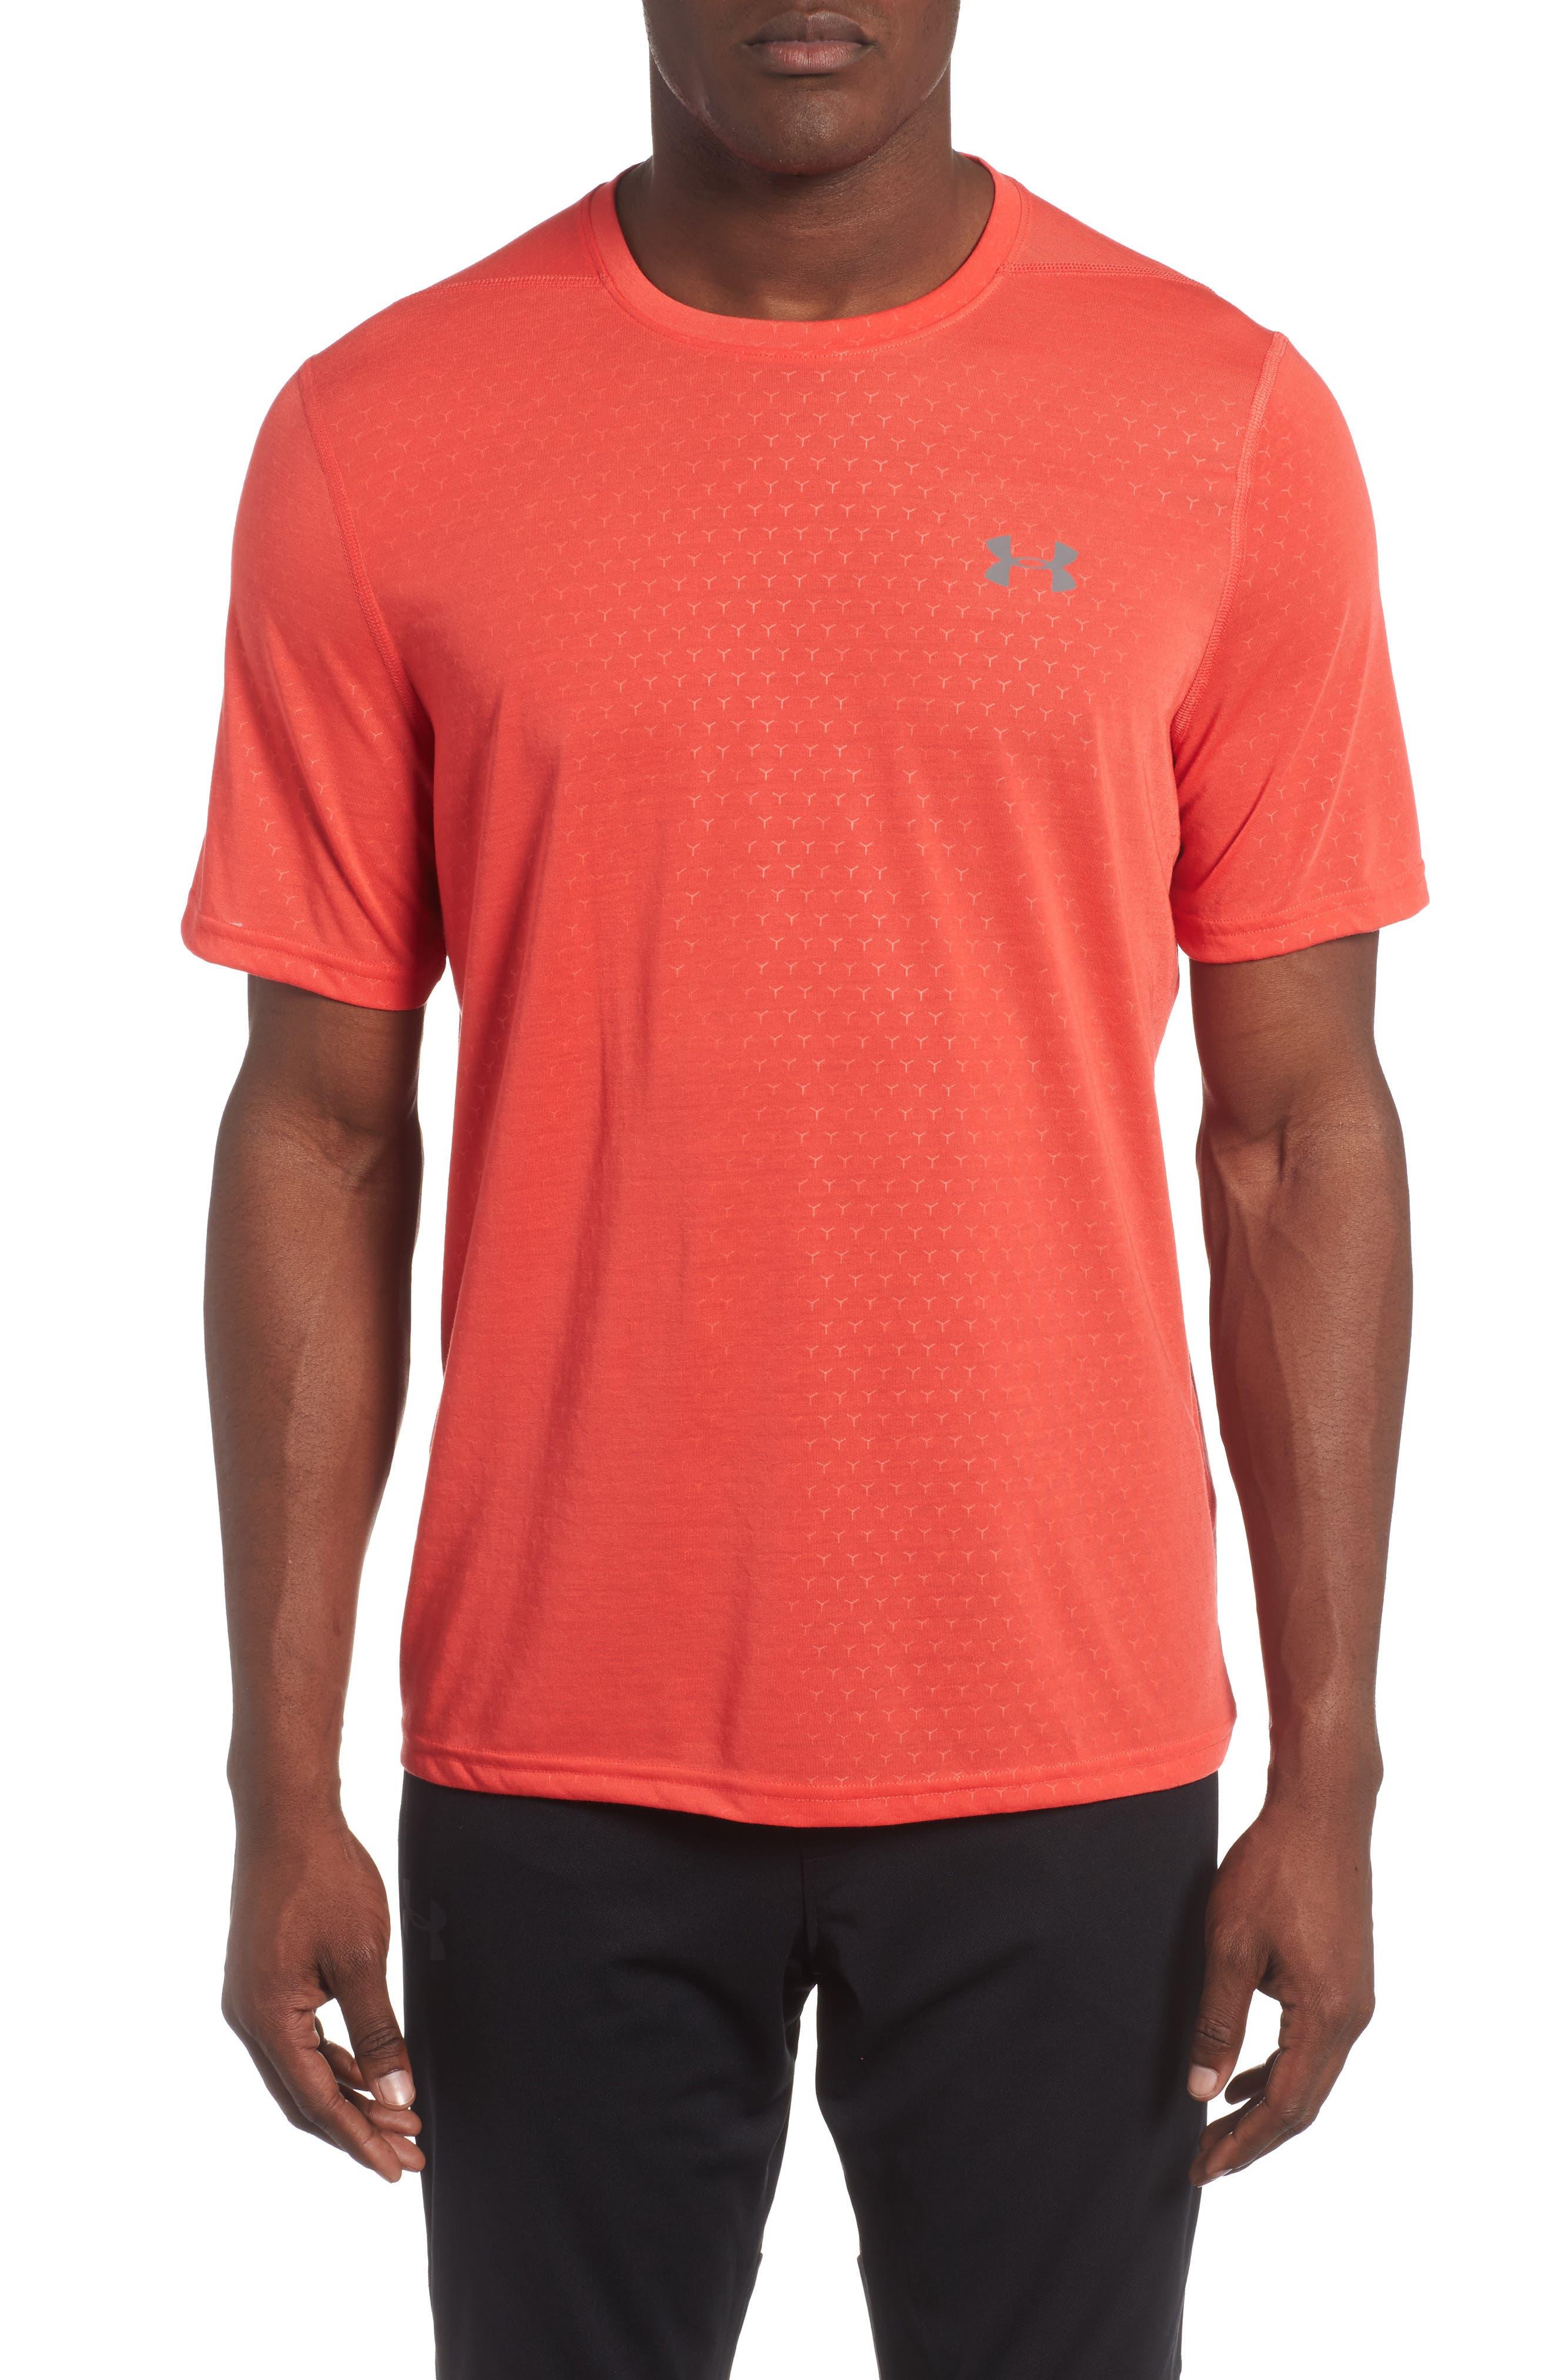 Alternate Image 1 Selected - Under Armour Threadborne Siro Regular Fit T-Shirt